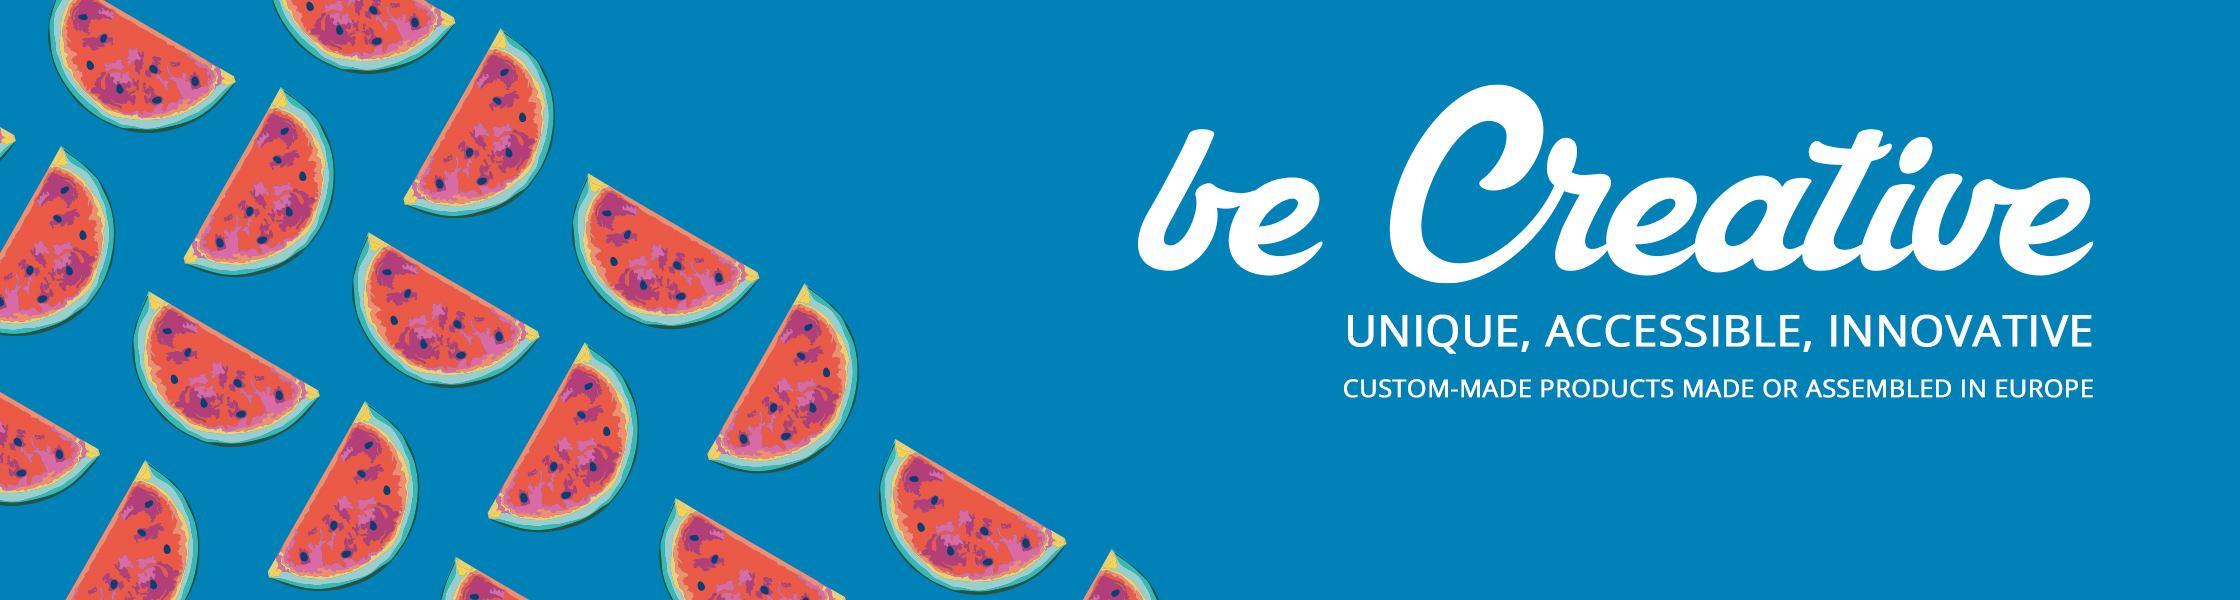 Unser neuer, einzigartiger BE CREATIVE 2021 E-Katalog ist da!